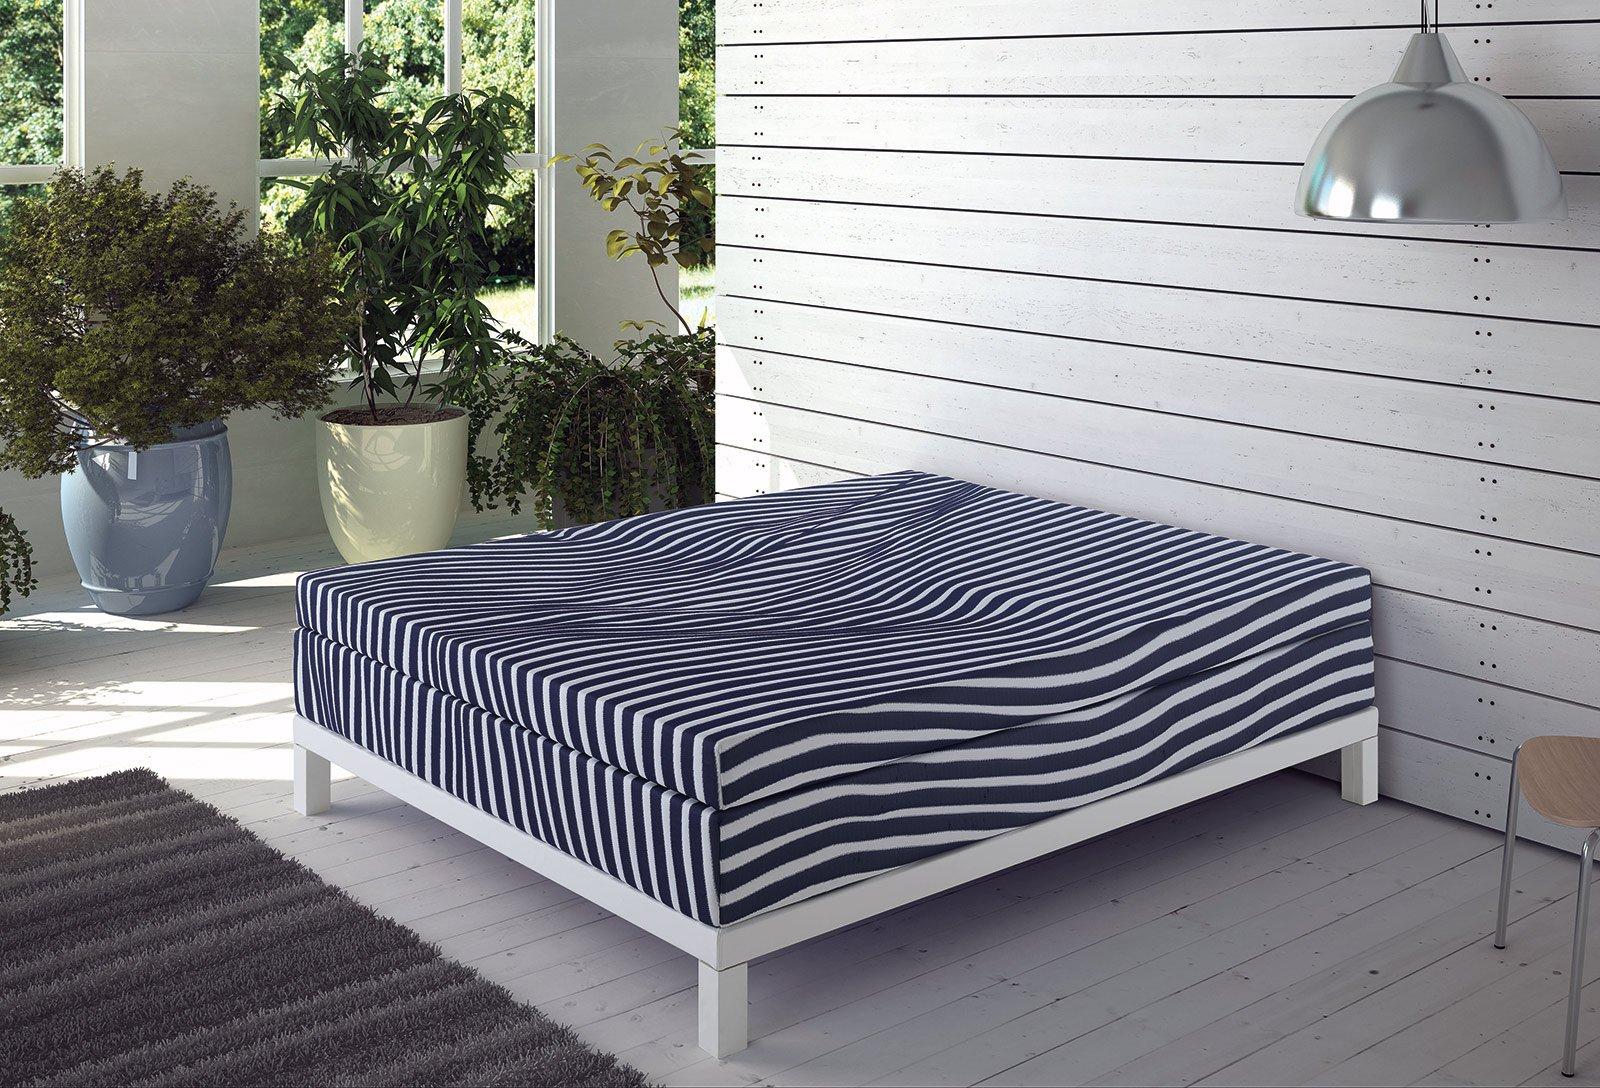 camere da letto ikea : 24 best images about bedroom wall on ... - Materassi Per Divani Letto Ikea